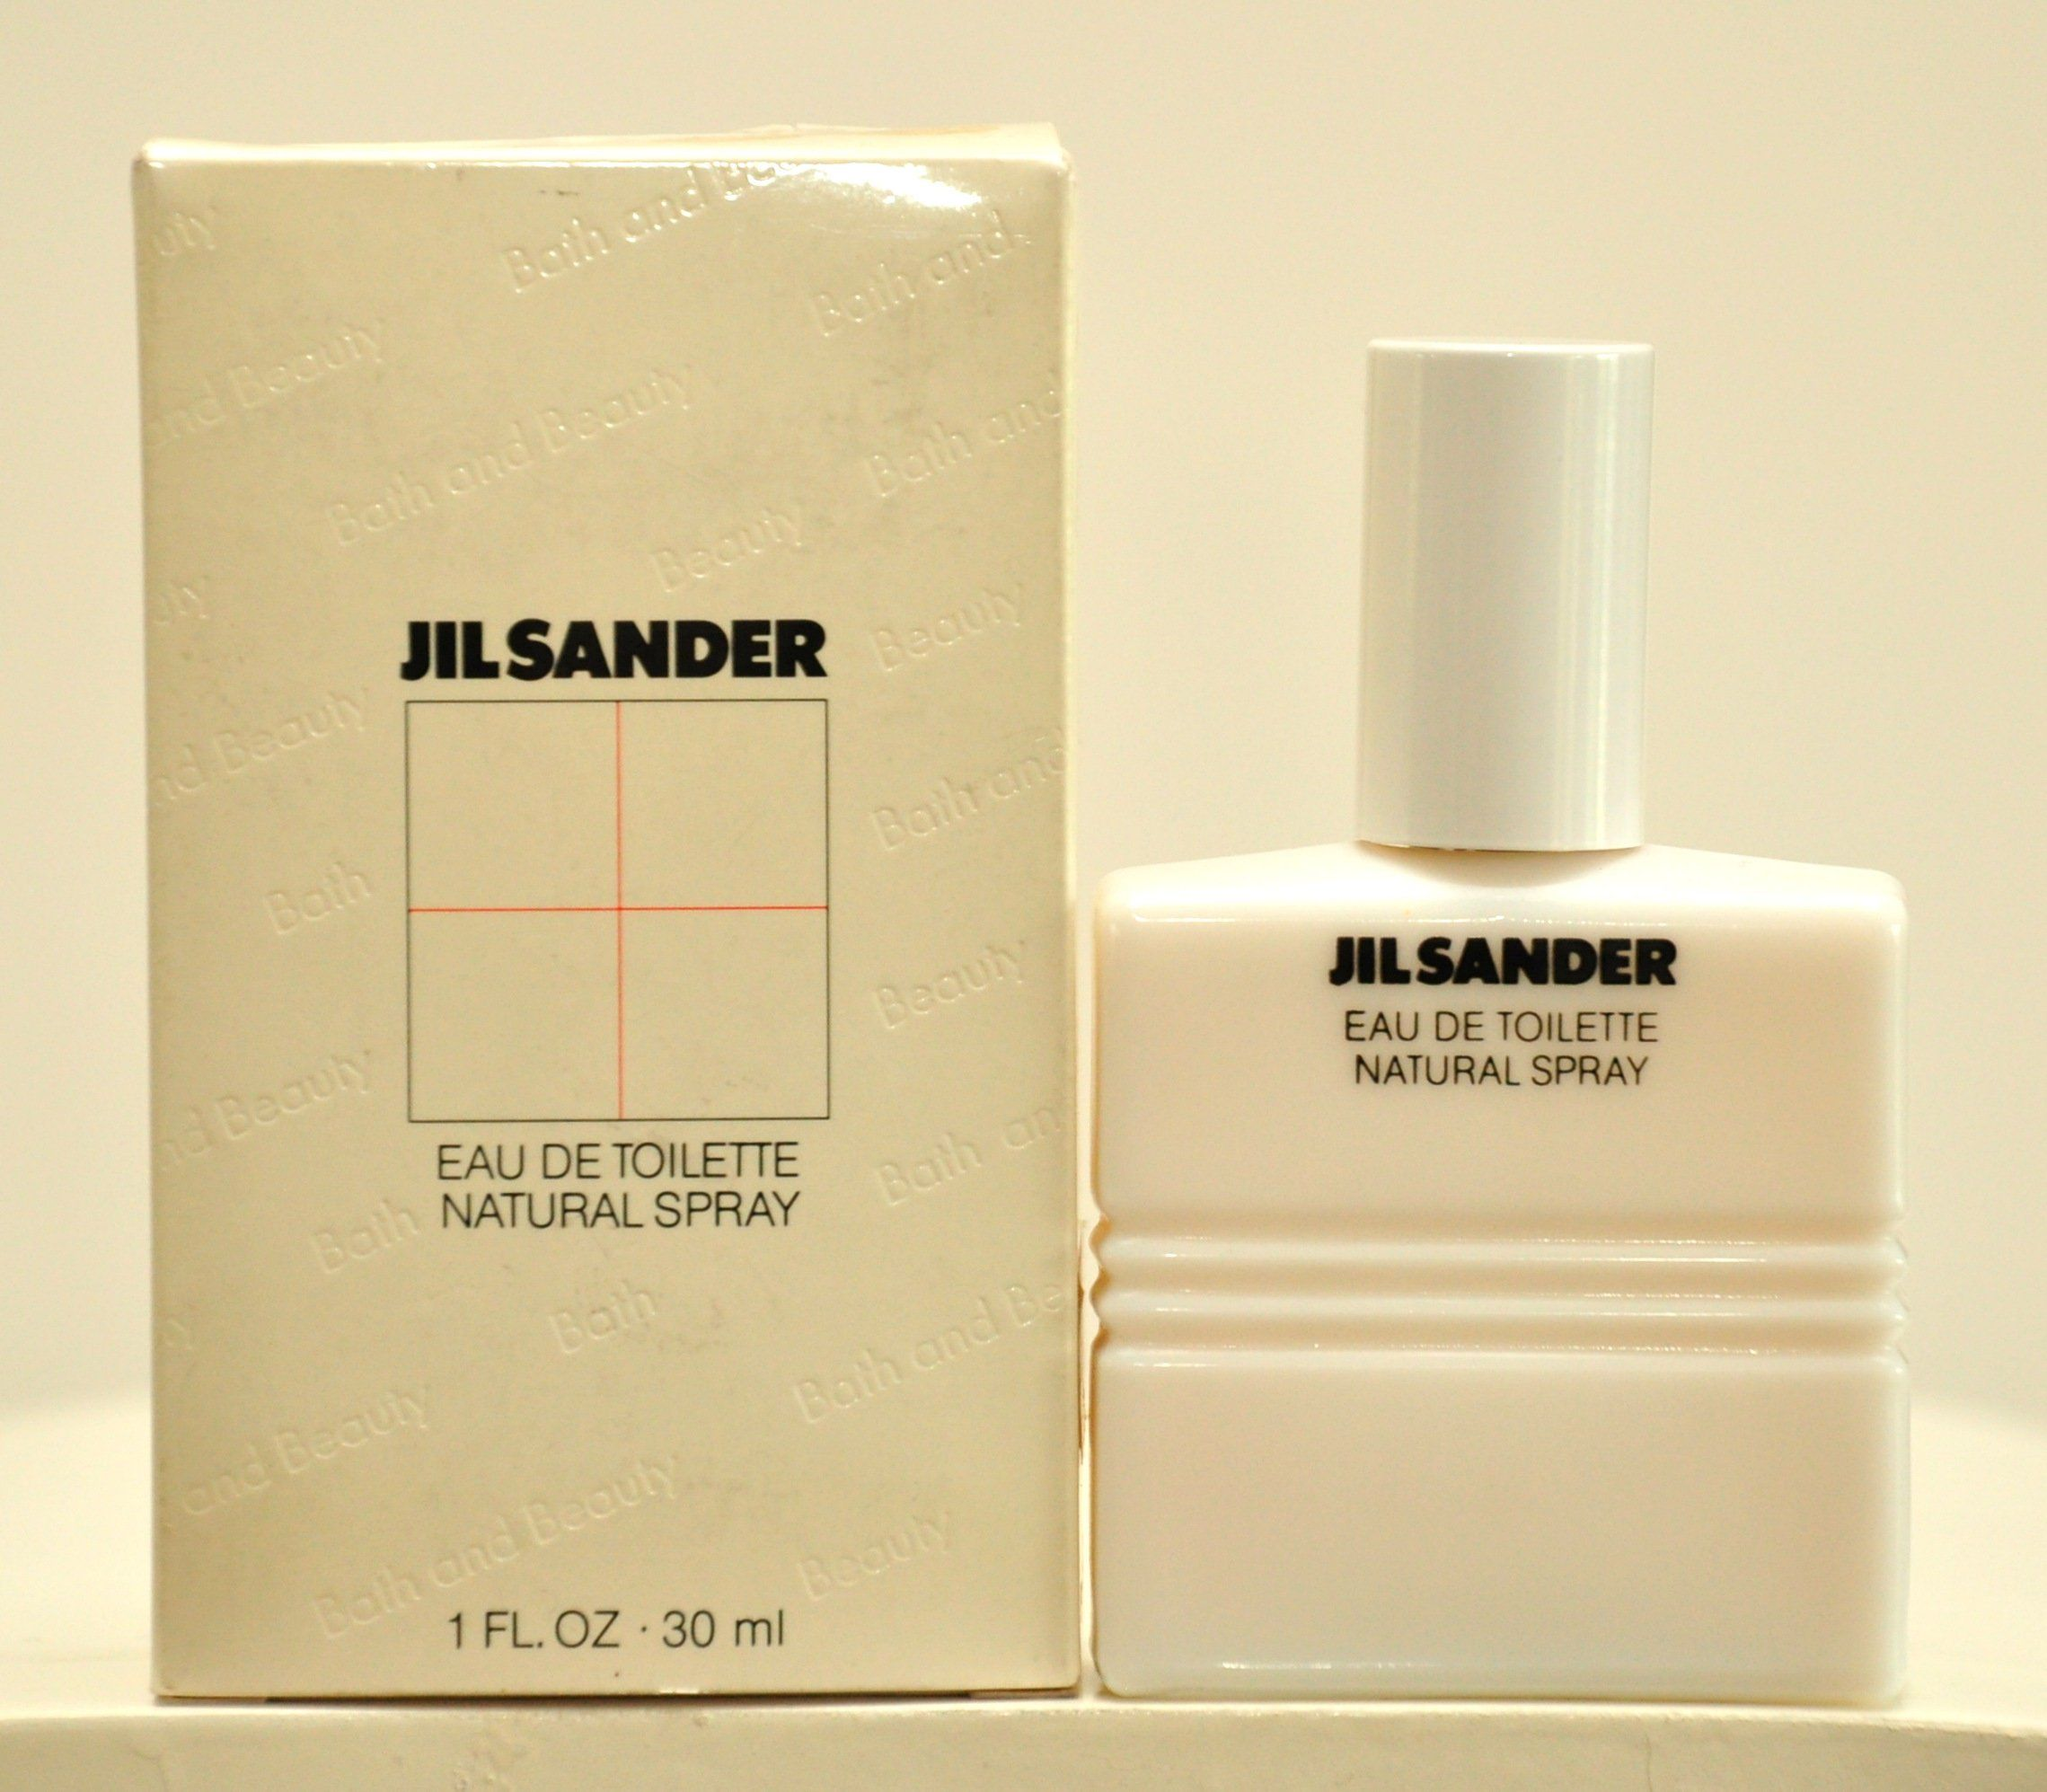 Jil Sander Bath And Beauty Eau De Toilette Edt Spray 30ml 1 Fl Oz Perfume Woman Rare Vintage Old 1981